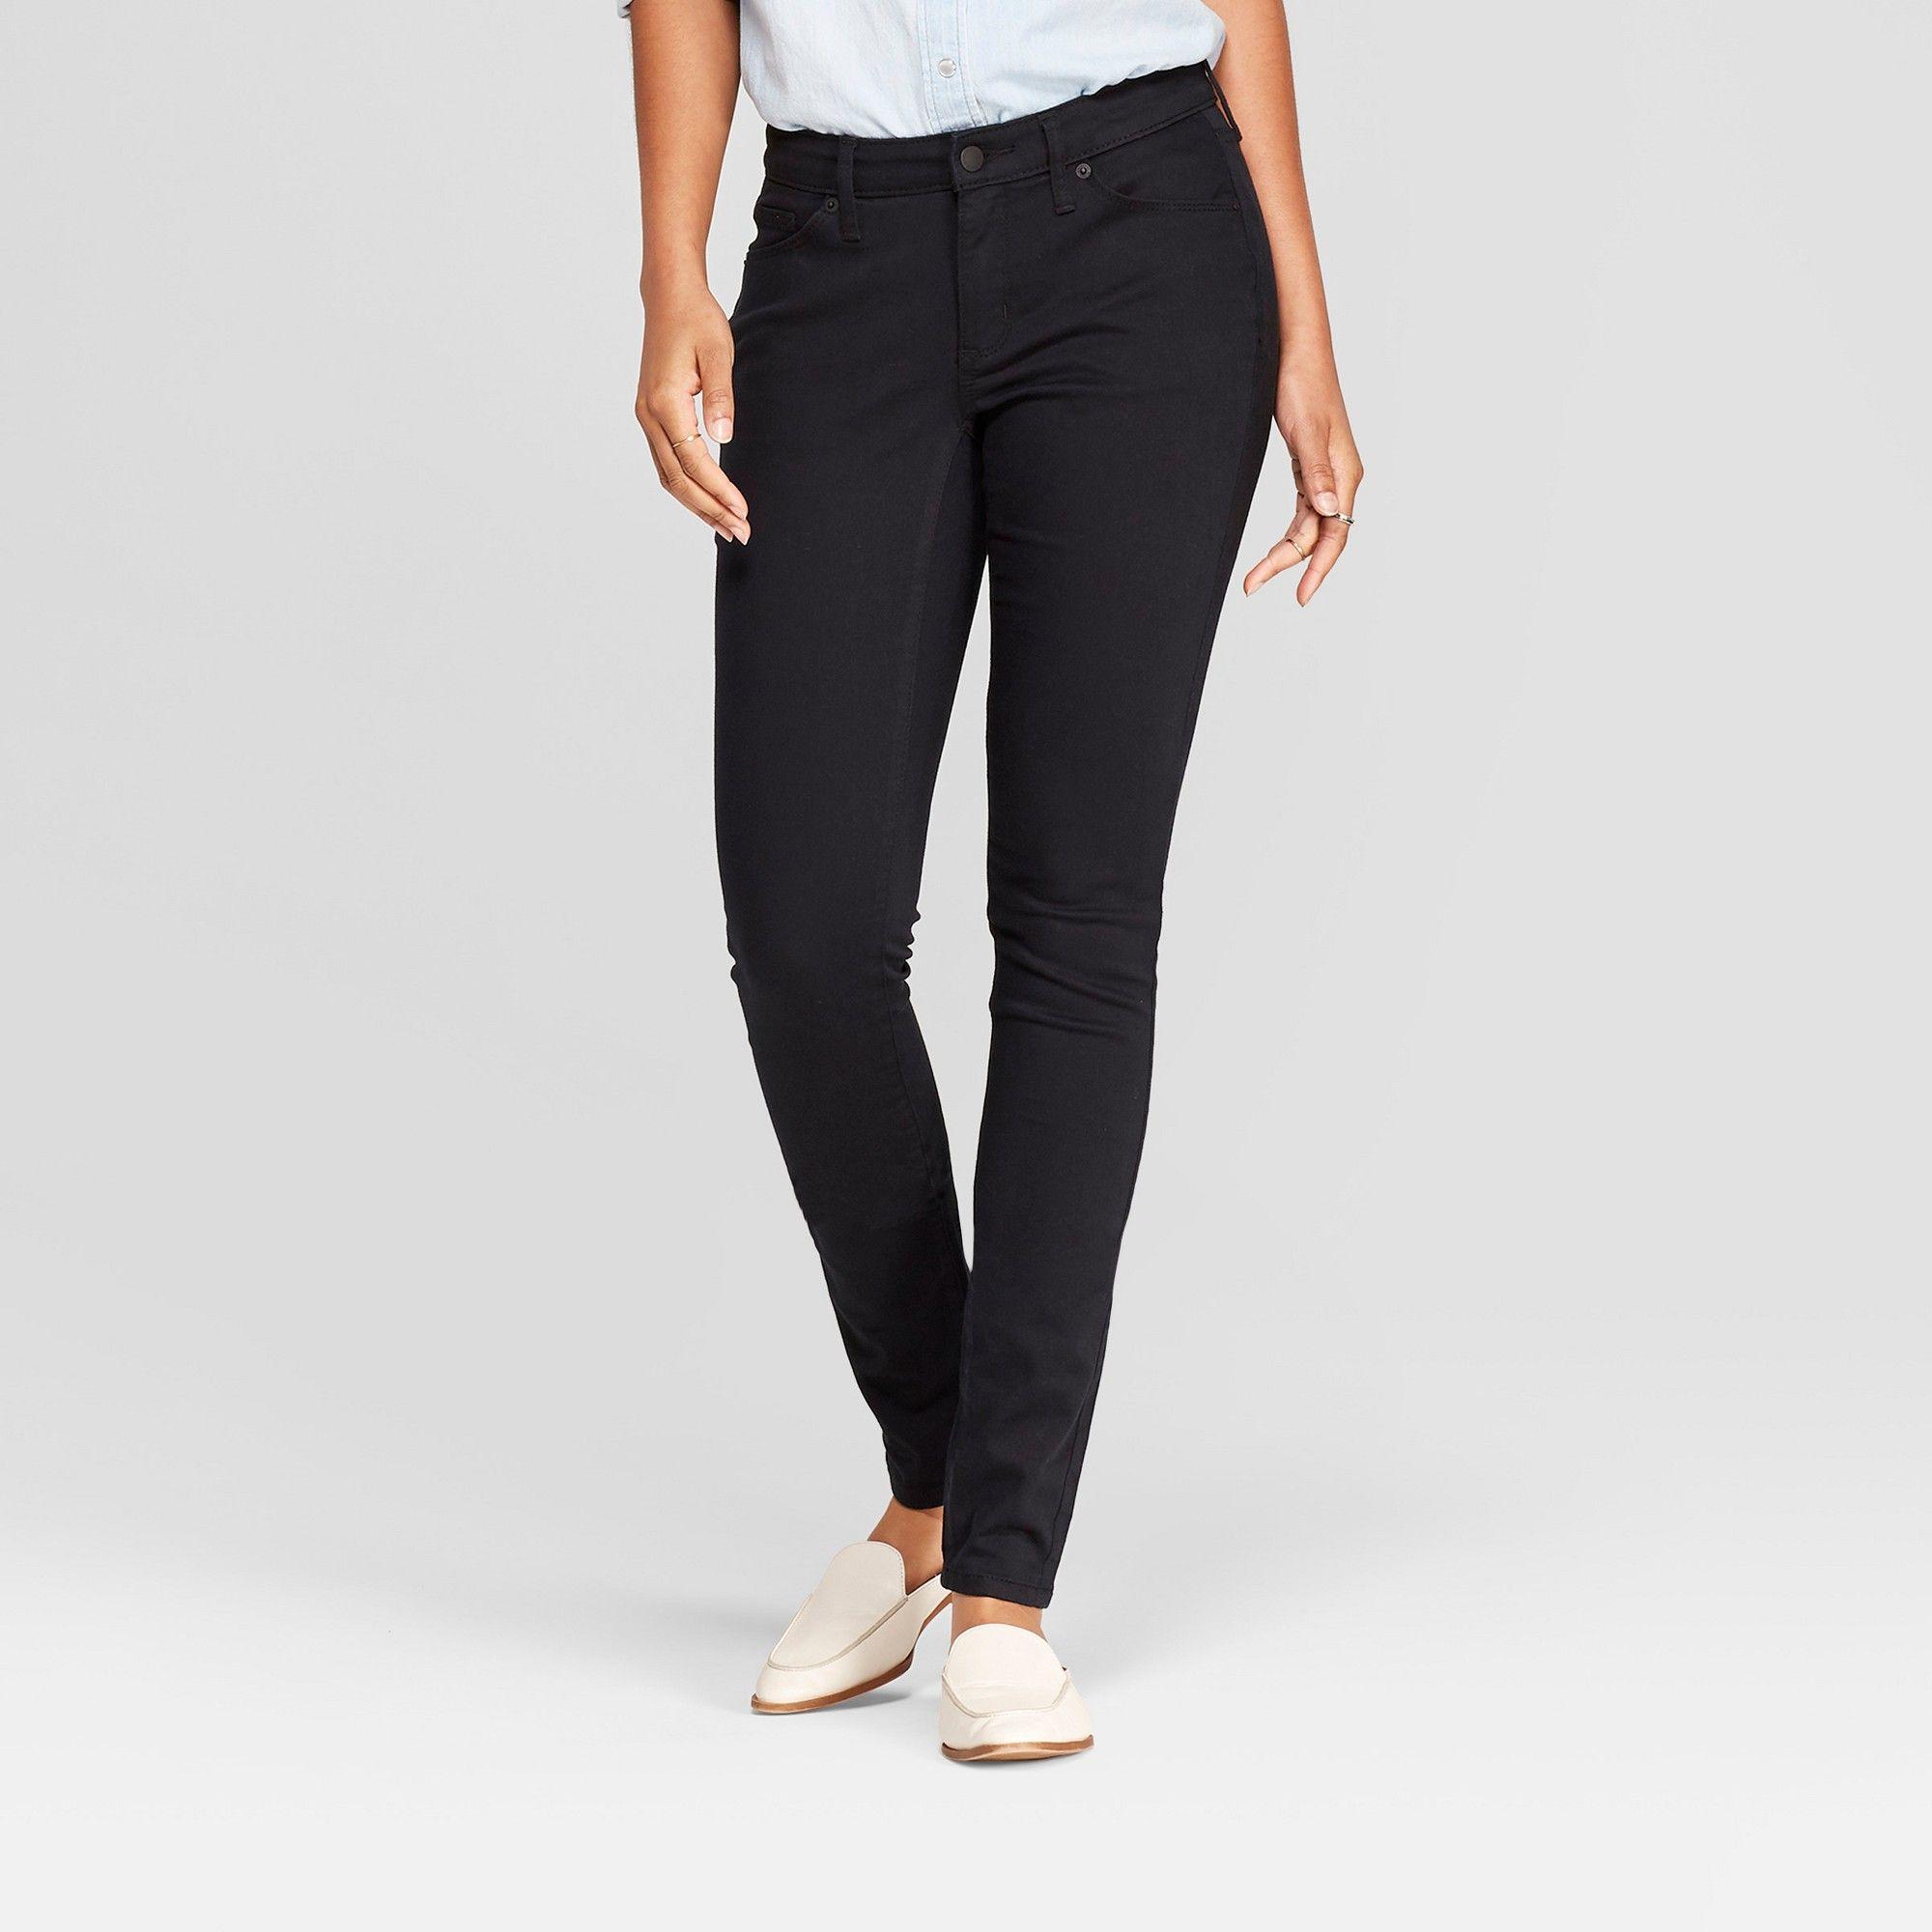 8d2a934950b Women s Mid-Rise Curvy Skinny Jeans - Universal Thread Black Wash 14 Short